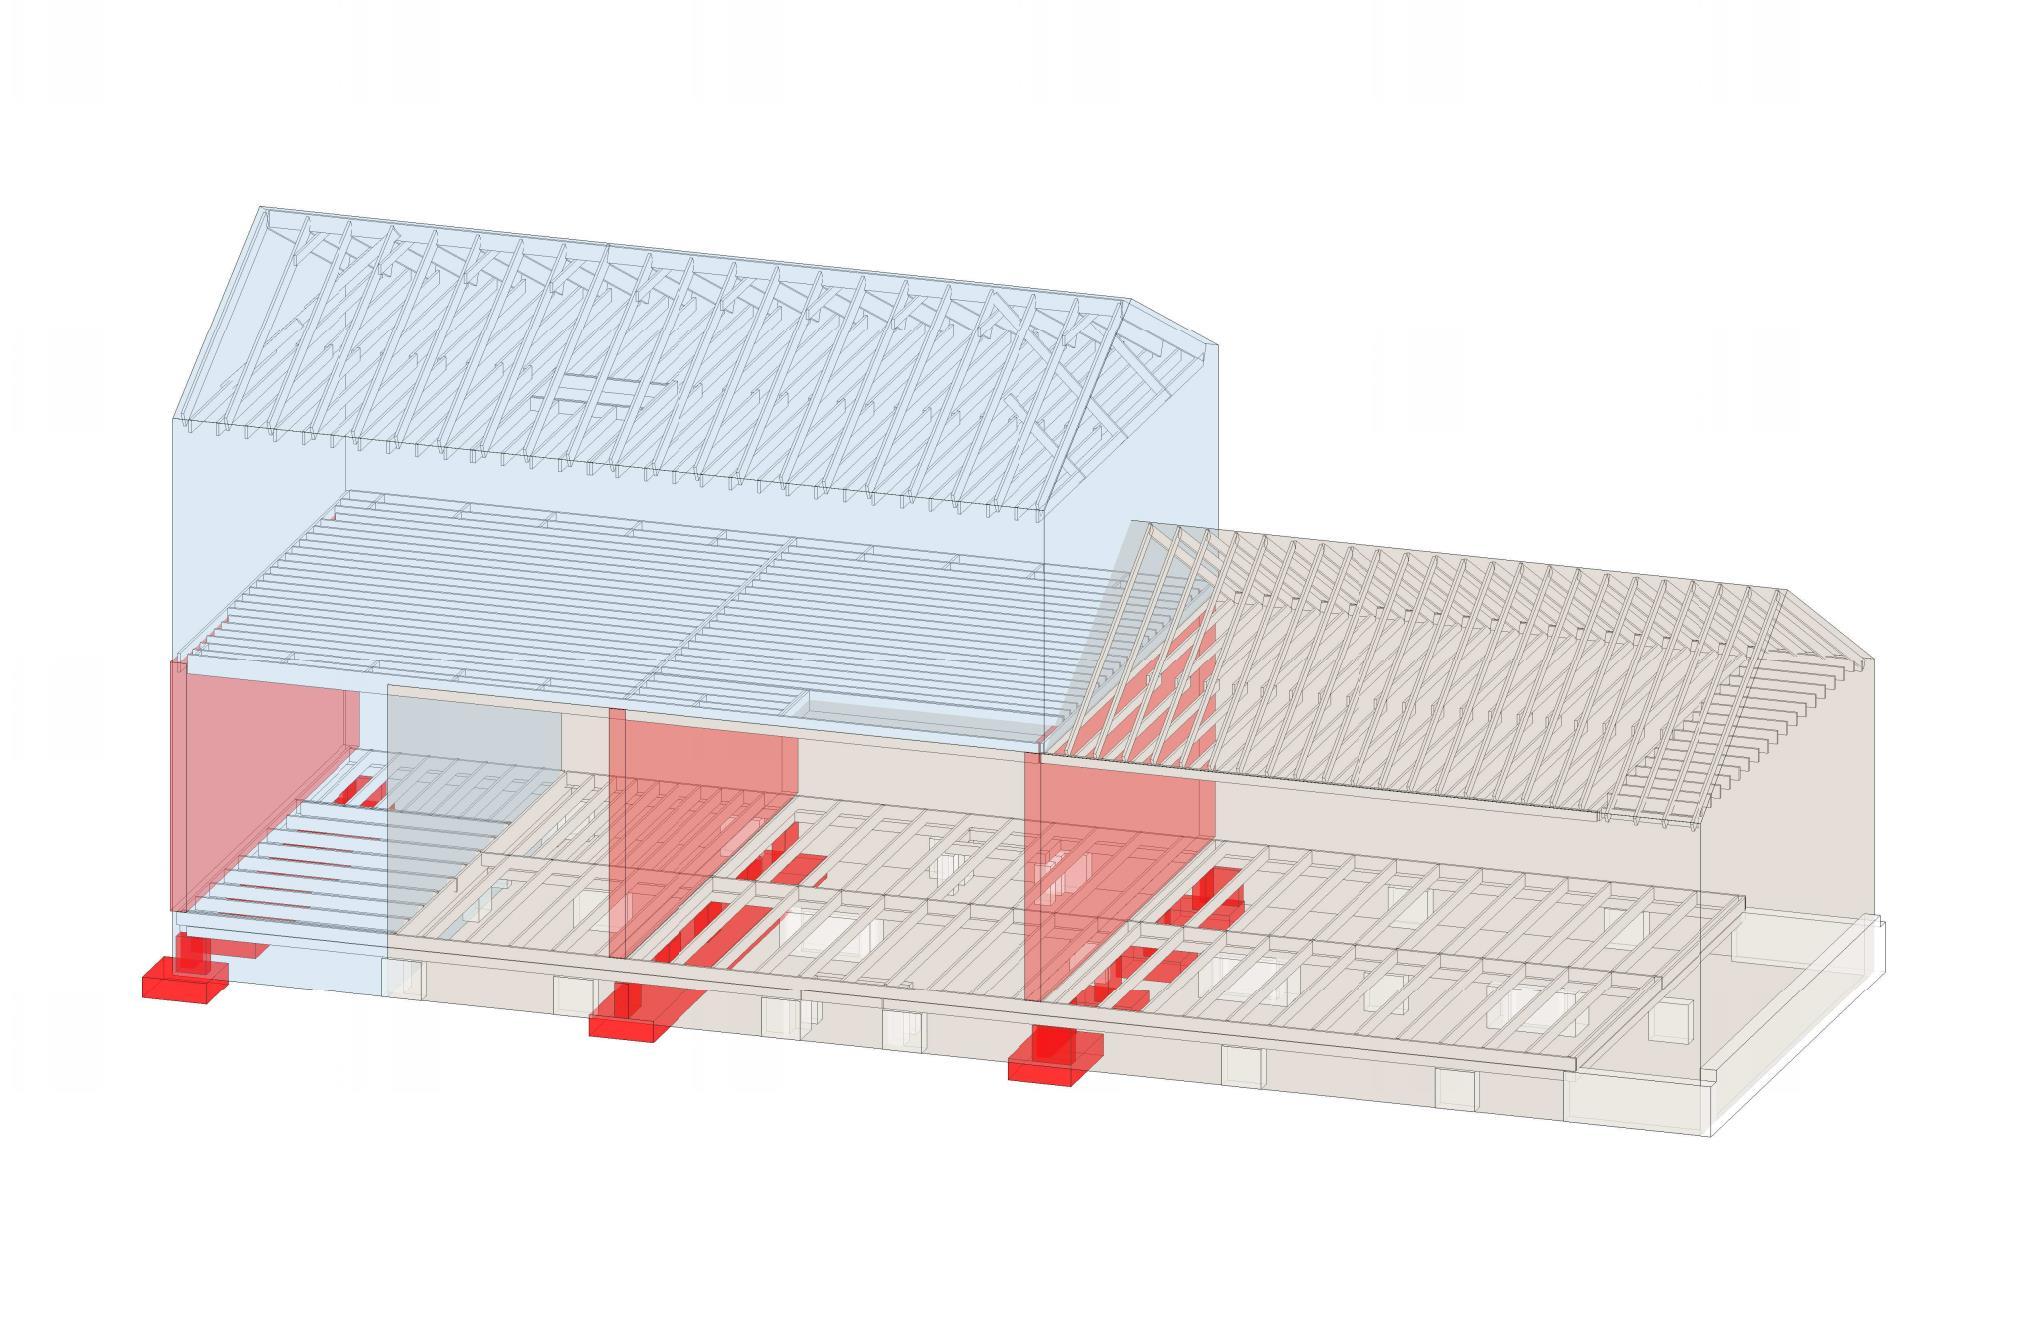 image showing load bearing walls